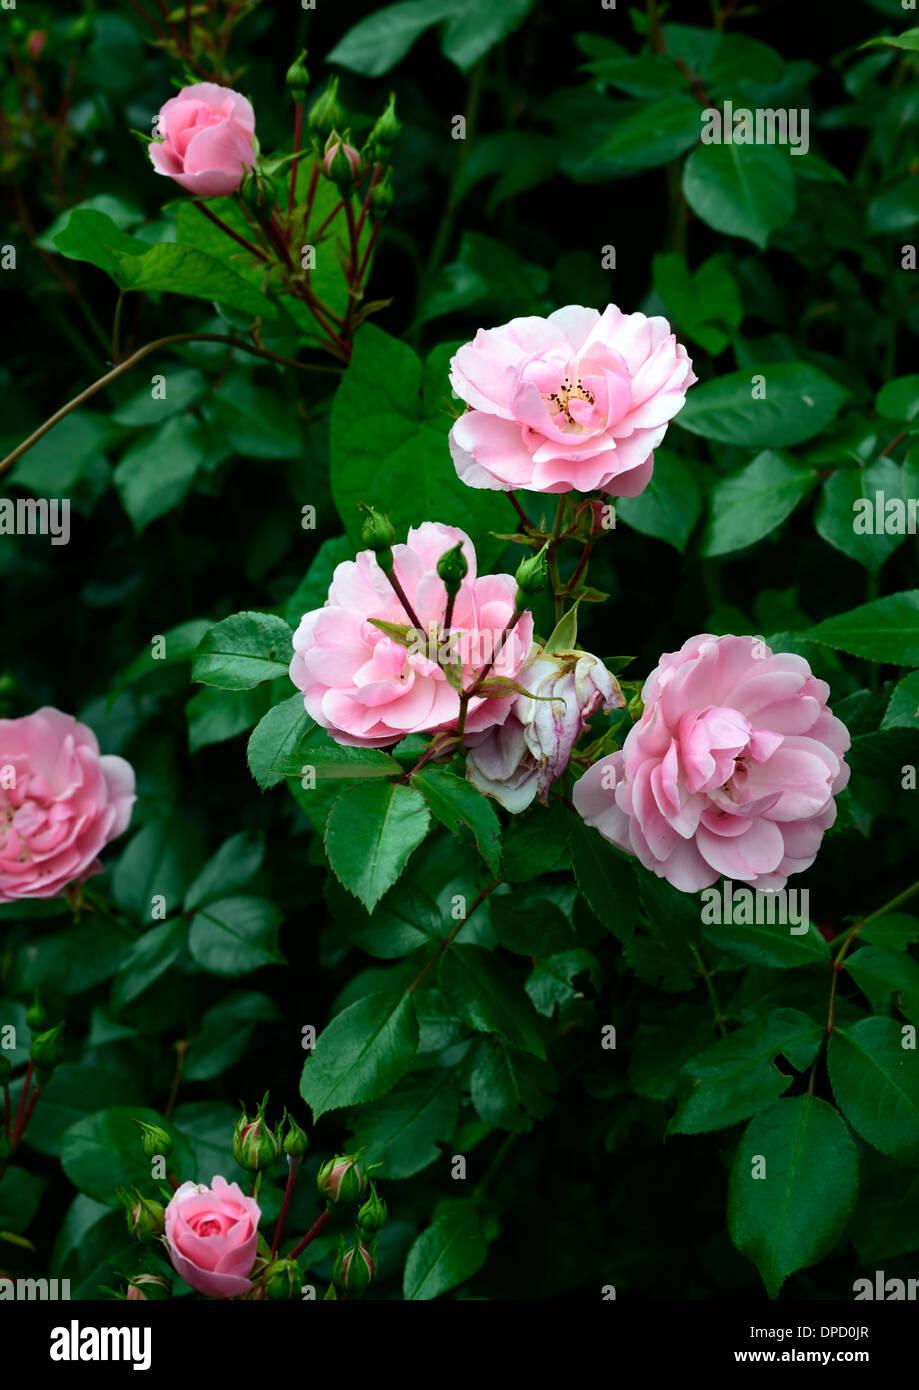 stock photo rosa bonica meidomonac shrub rose pink flowers flowering fragrant roses scented blooms - Fragrant Roses